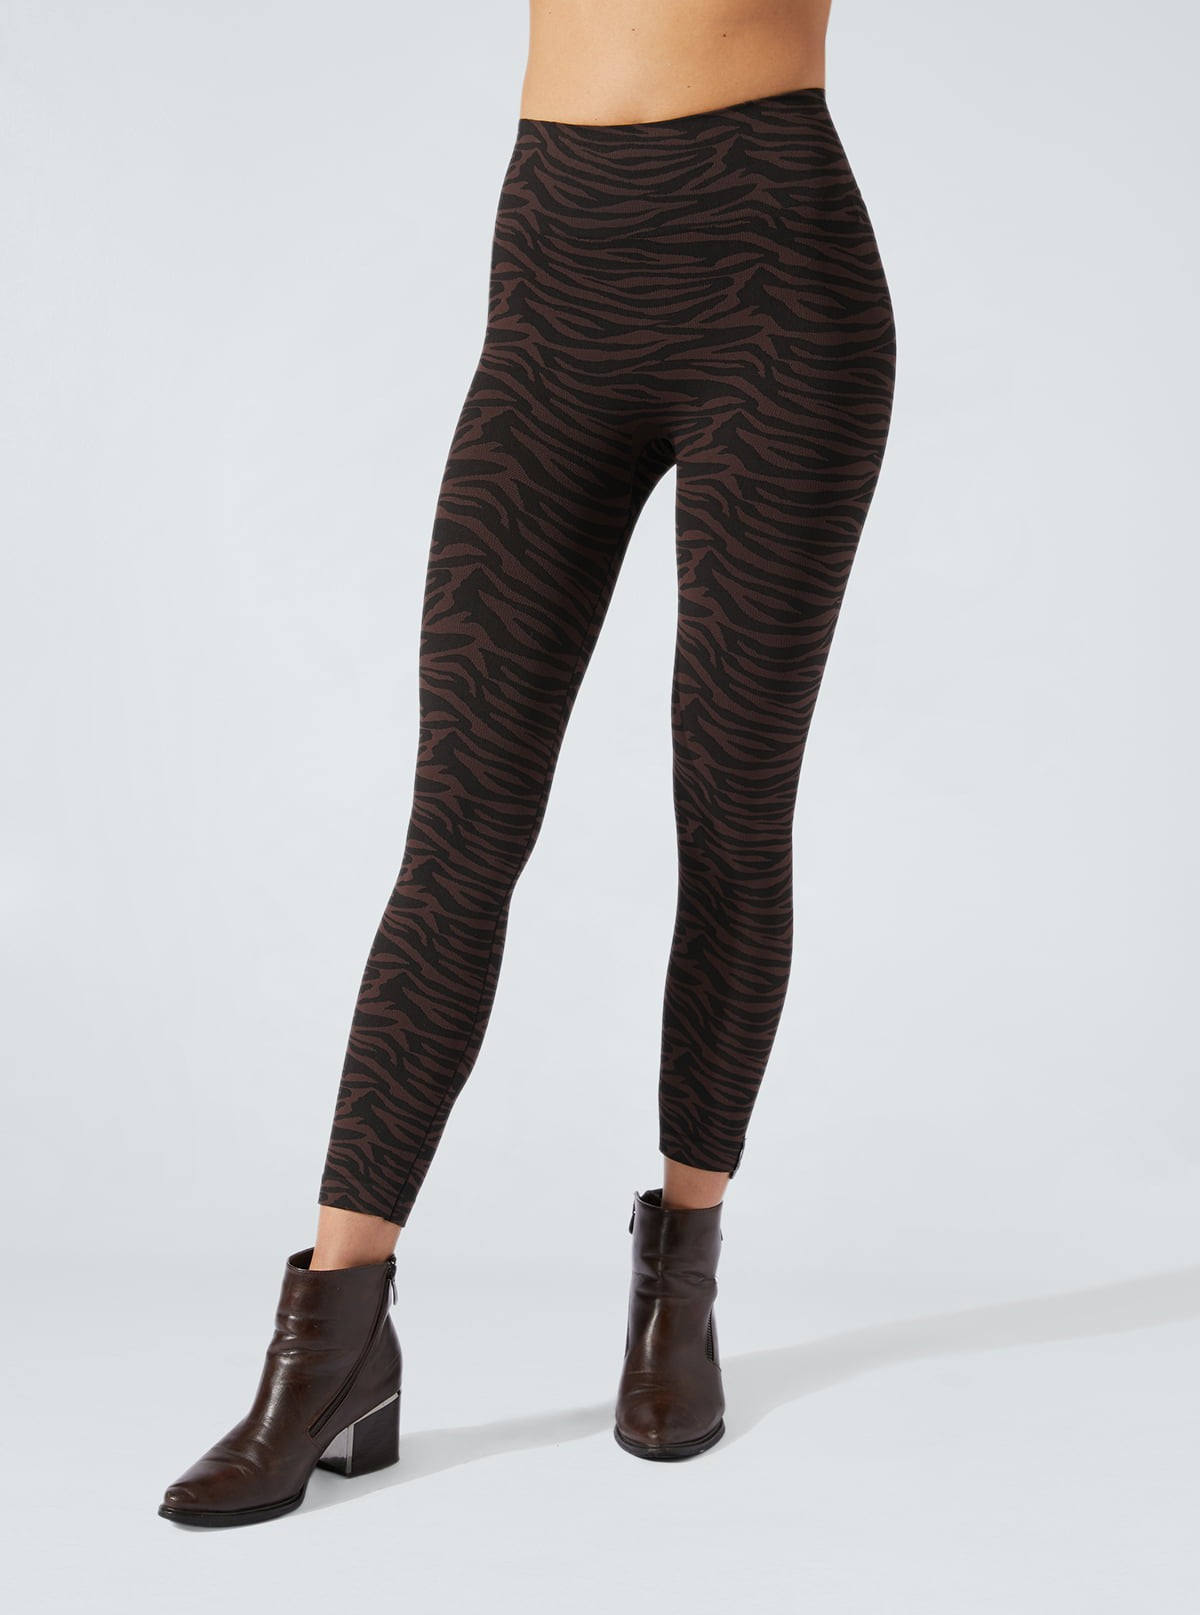 Black-Brown Zebra Animalier Legging in Dermofibra® Cosmetics